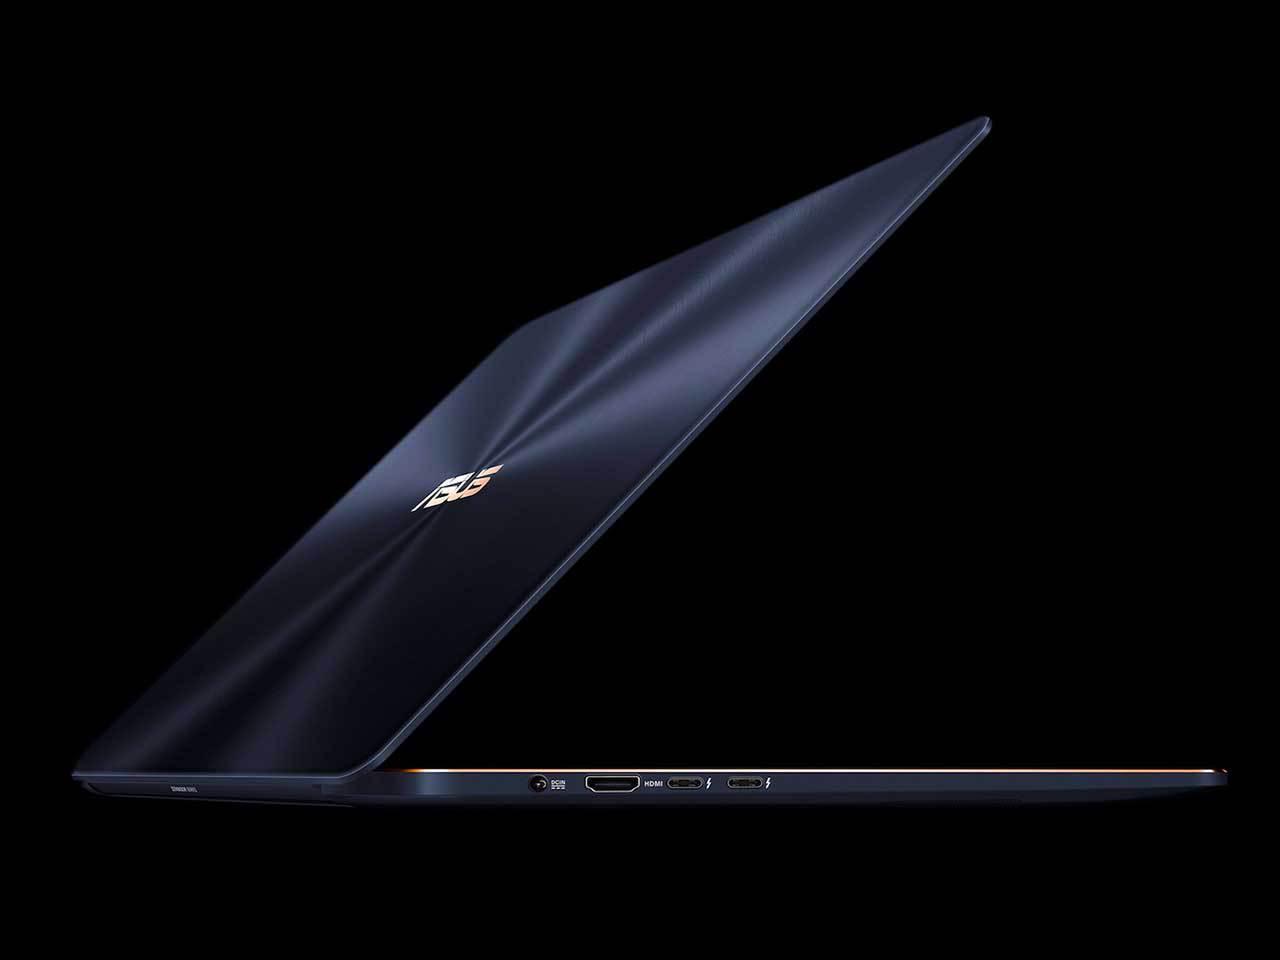 Zenbook Pro 15 أول لاب توب بمعالج Core i9 من أسوس